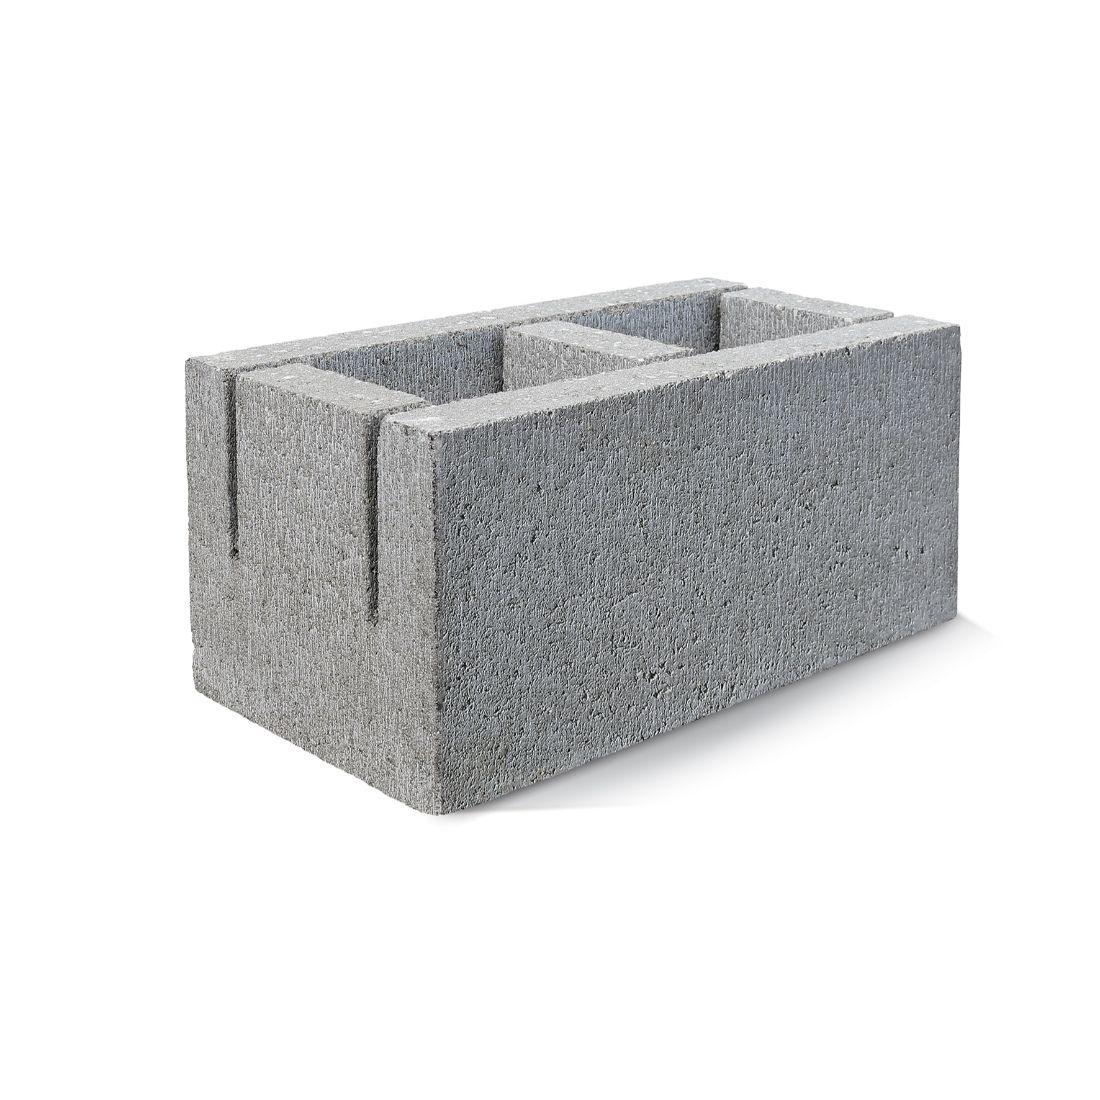 20.14 Bond Beam Knock In Block 390 x 190 x 190mm